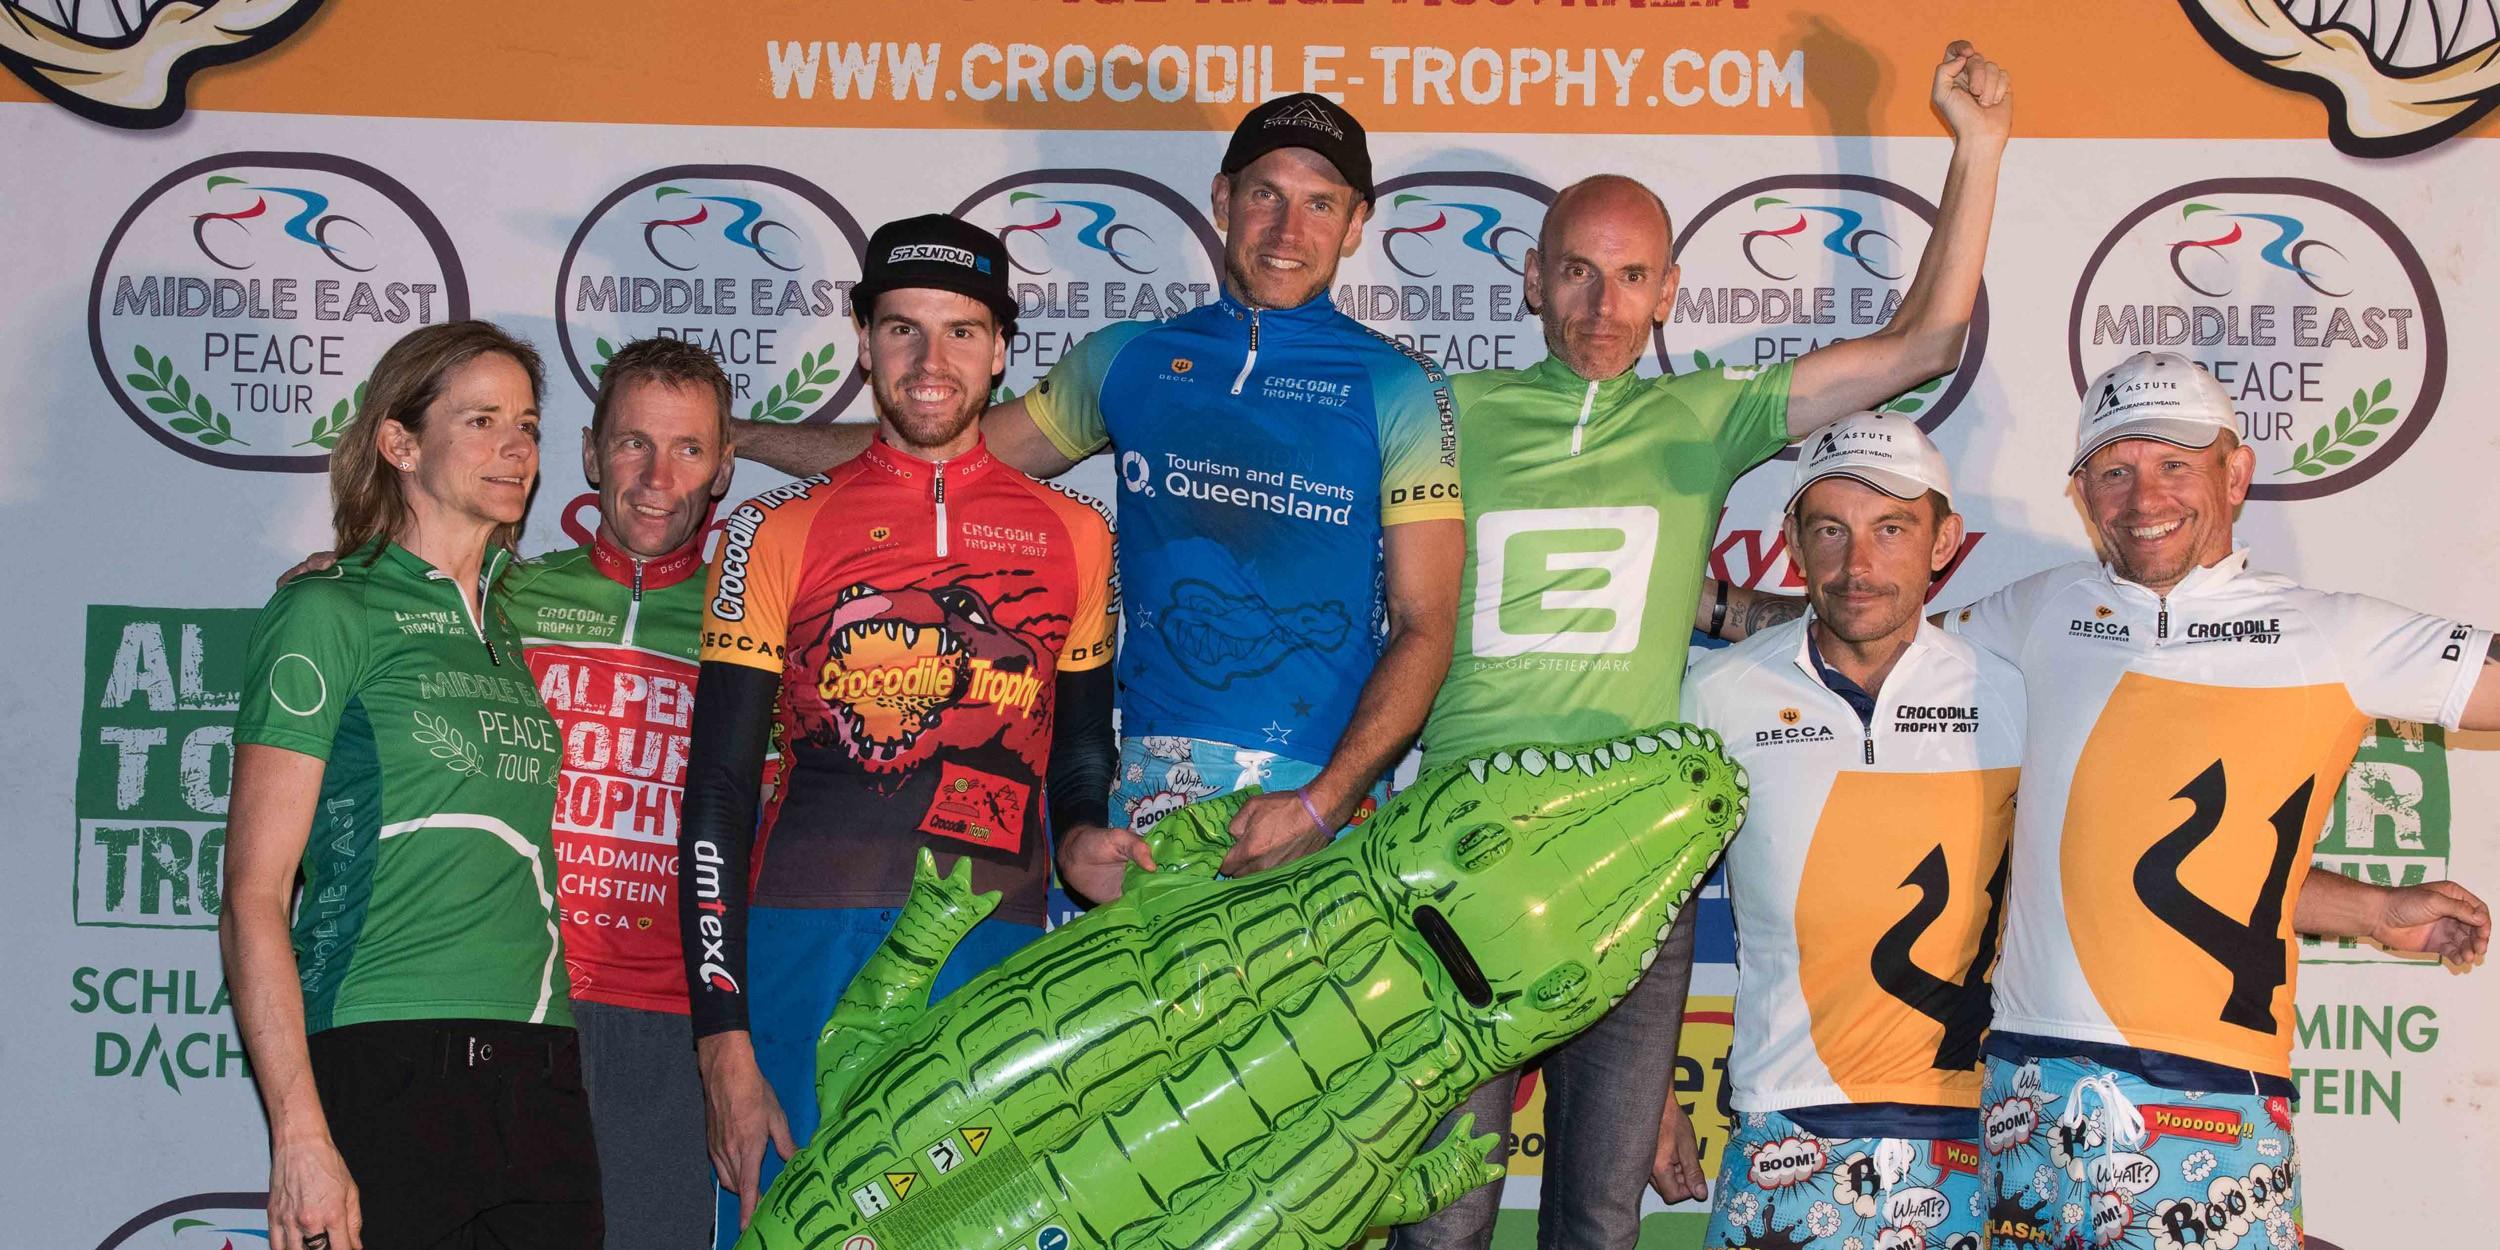 Crocodile Trophy 2017 Review